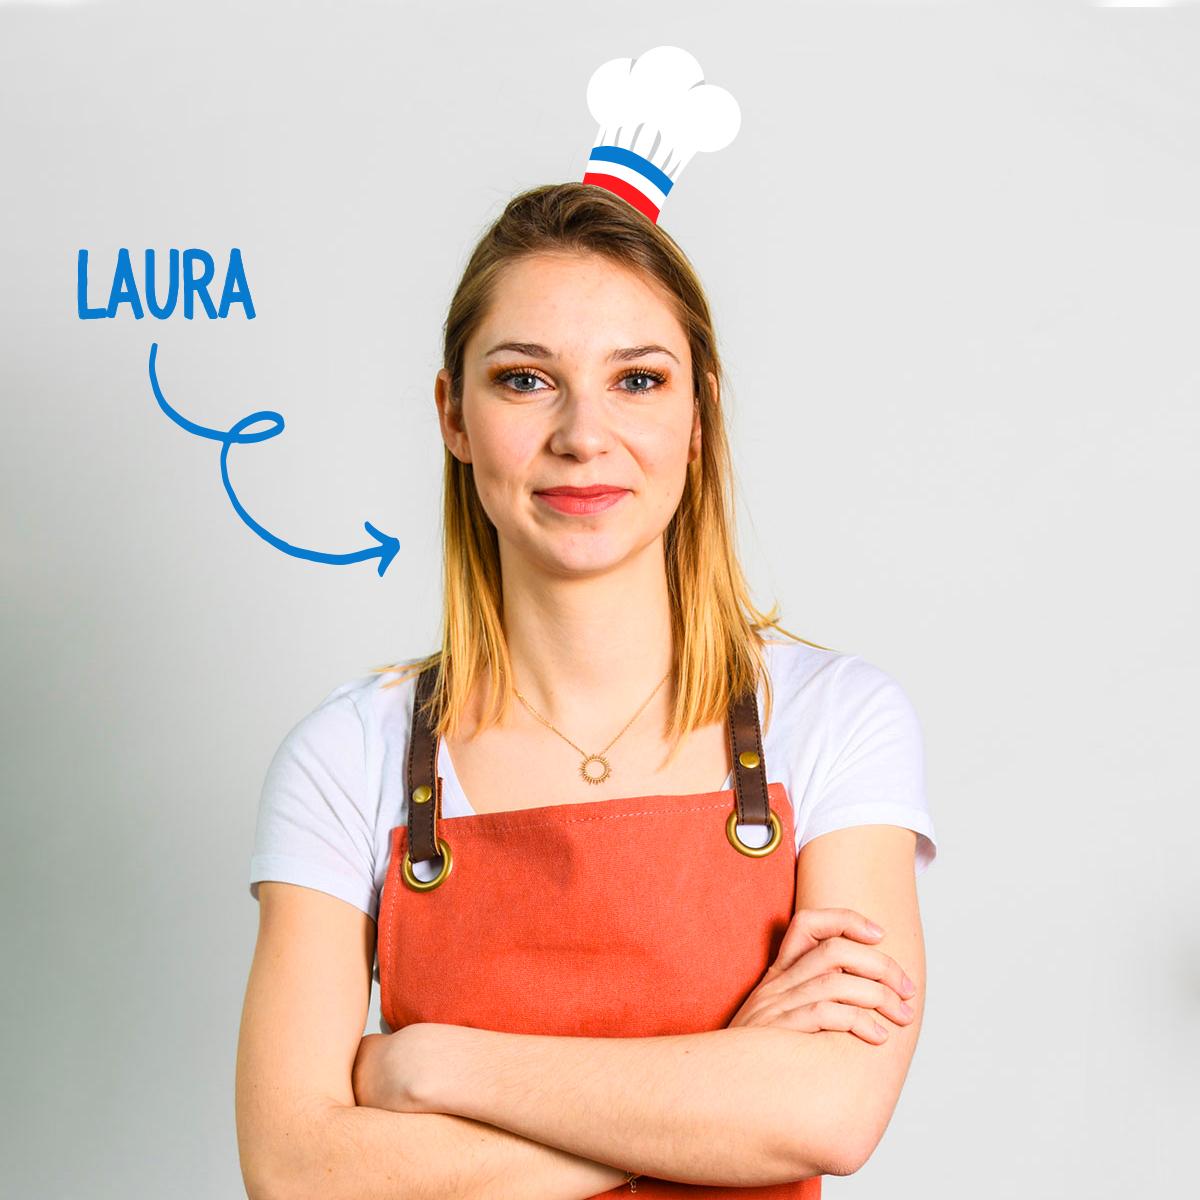 Laura - Le collectif